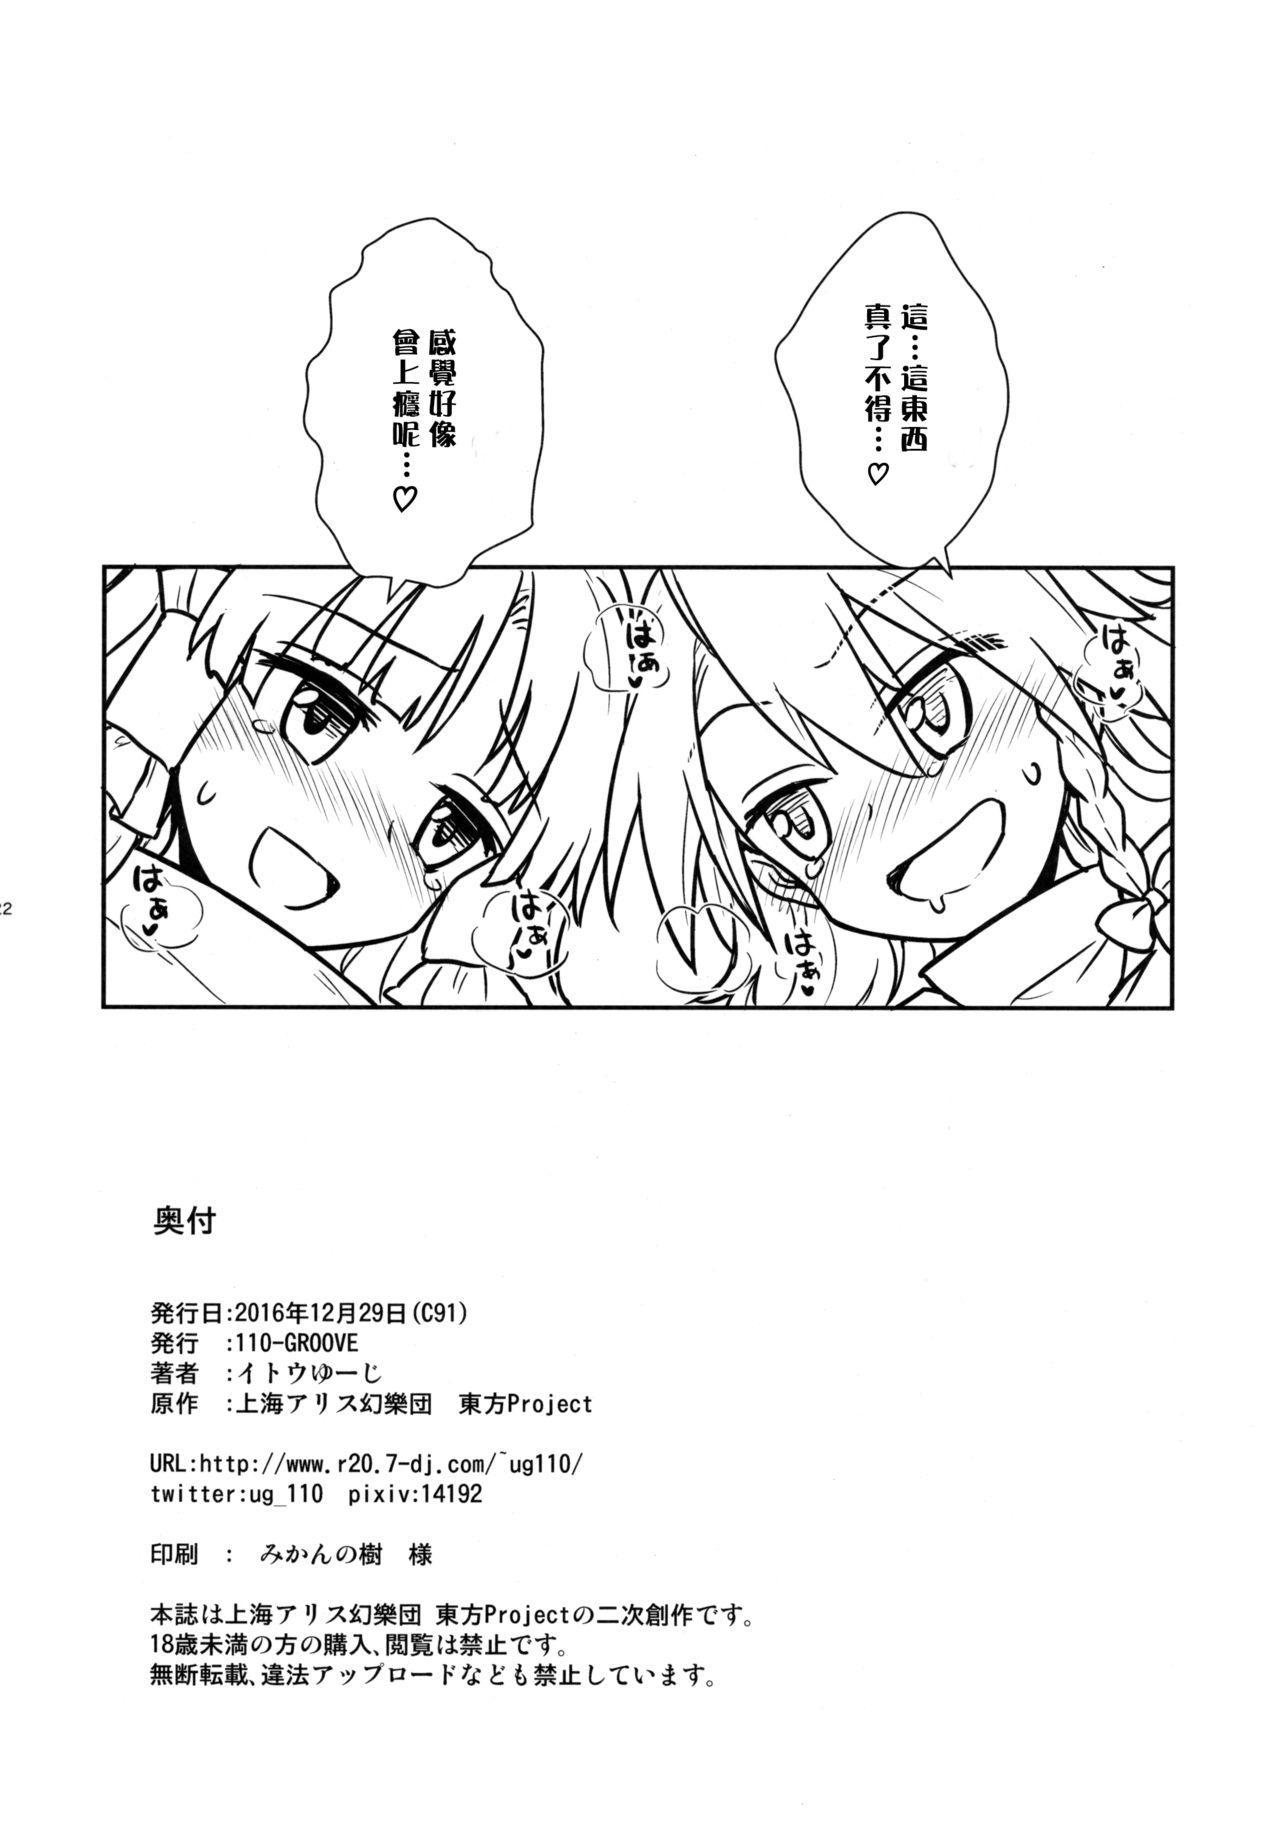 (C91) [110-GROOVE (Itou Yuuji)] Otoshigoro no Reimu-san to Marisa-san (Touhou Project) [Chinese] [冴月麟个人汉化] 20